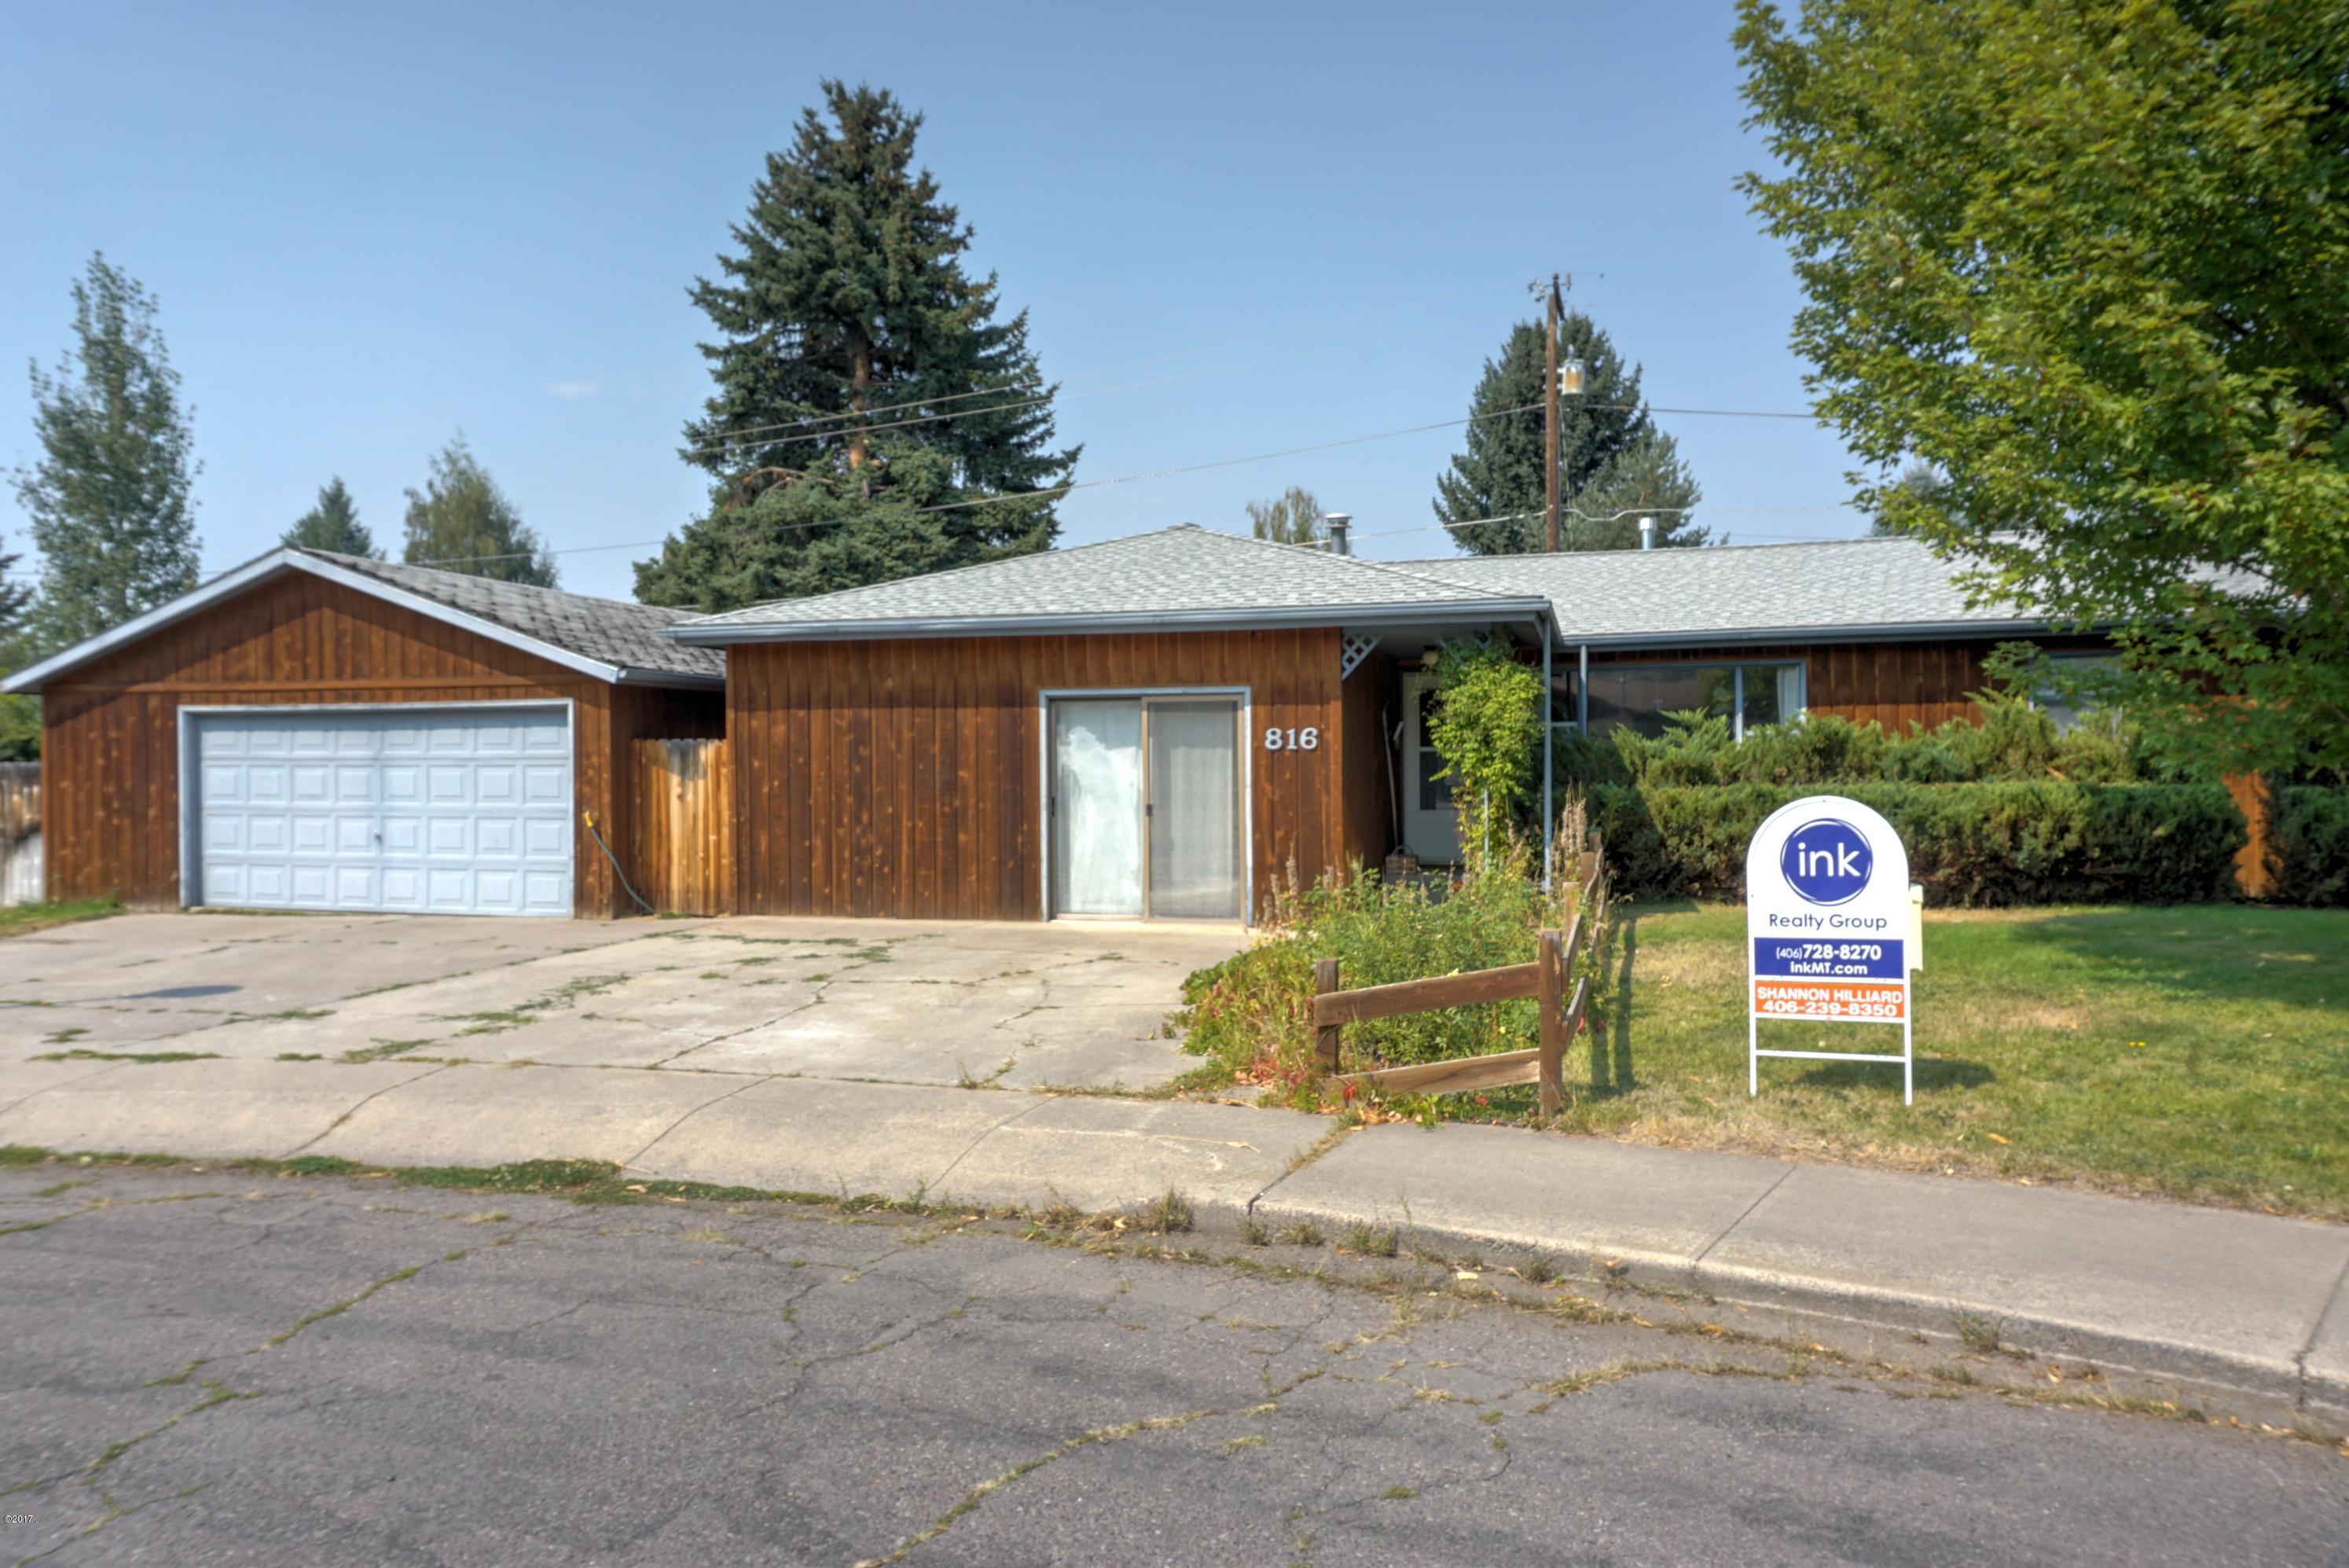 816 W Hallmark Lane, Missoula, MT 59801